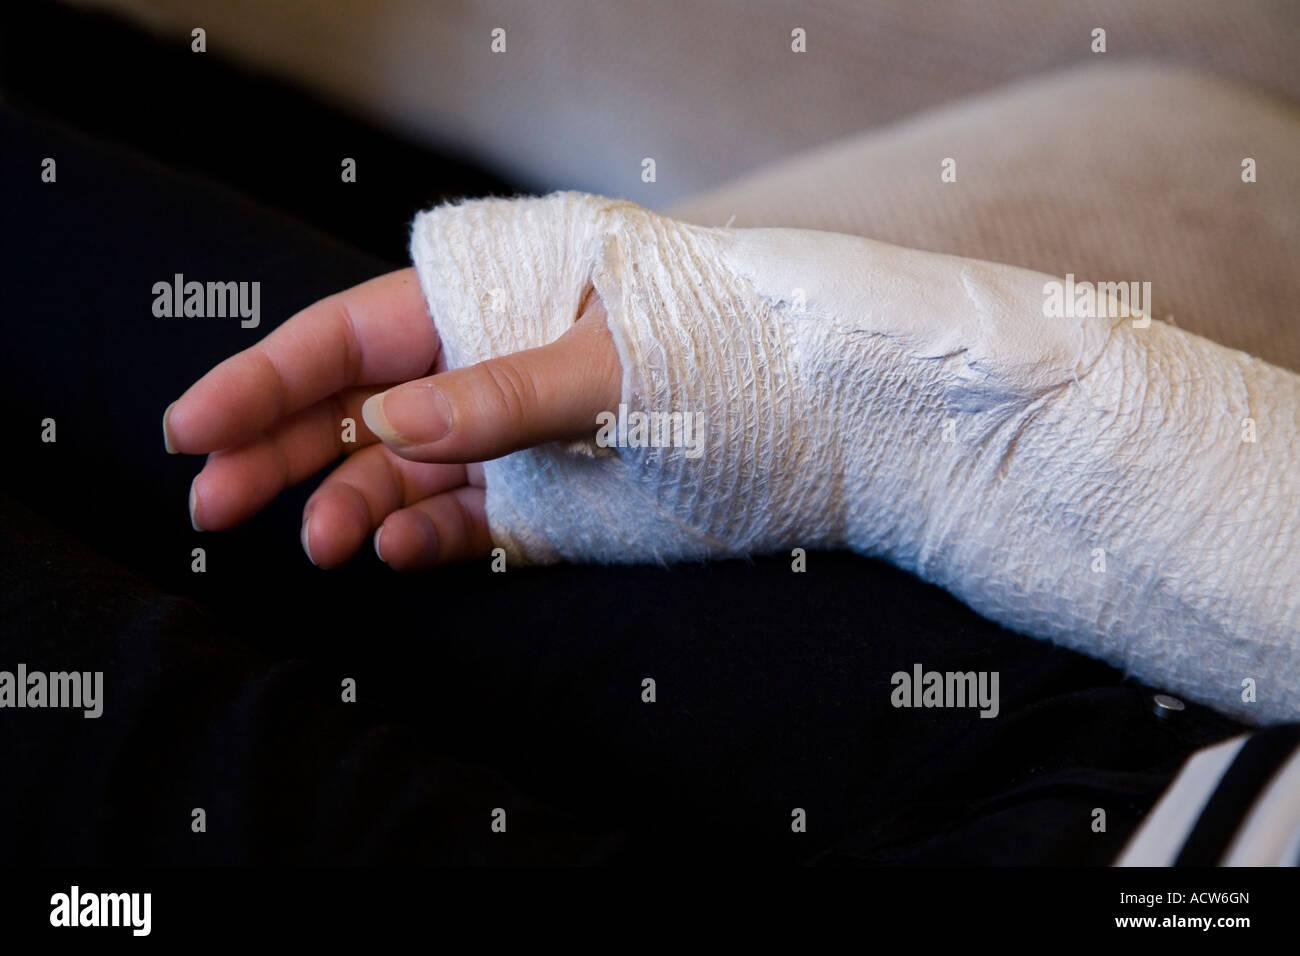 how to set a broken arm